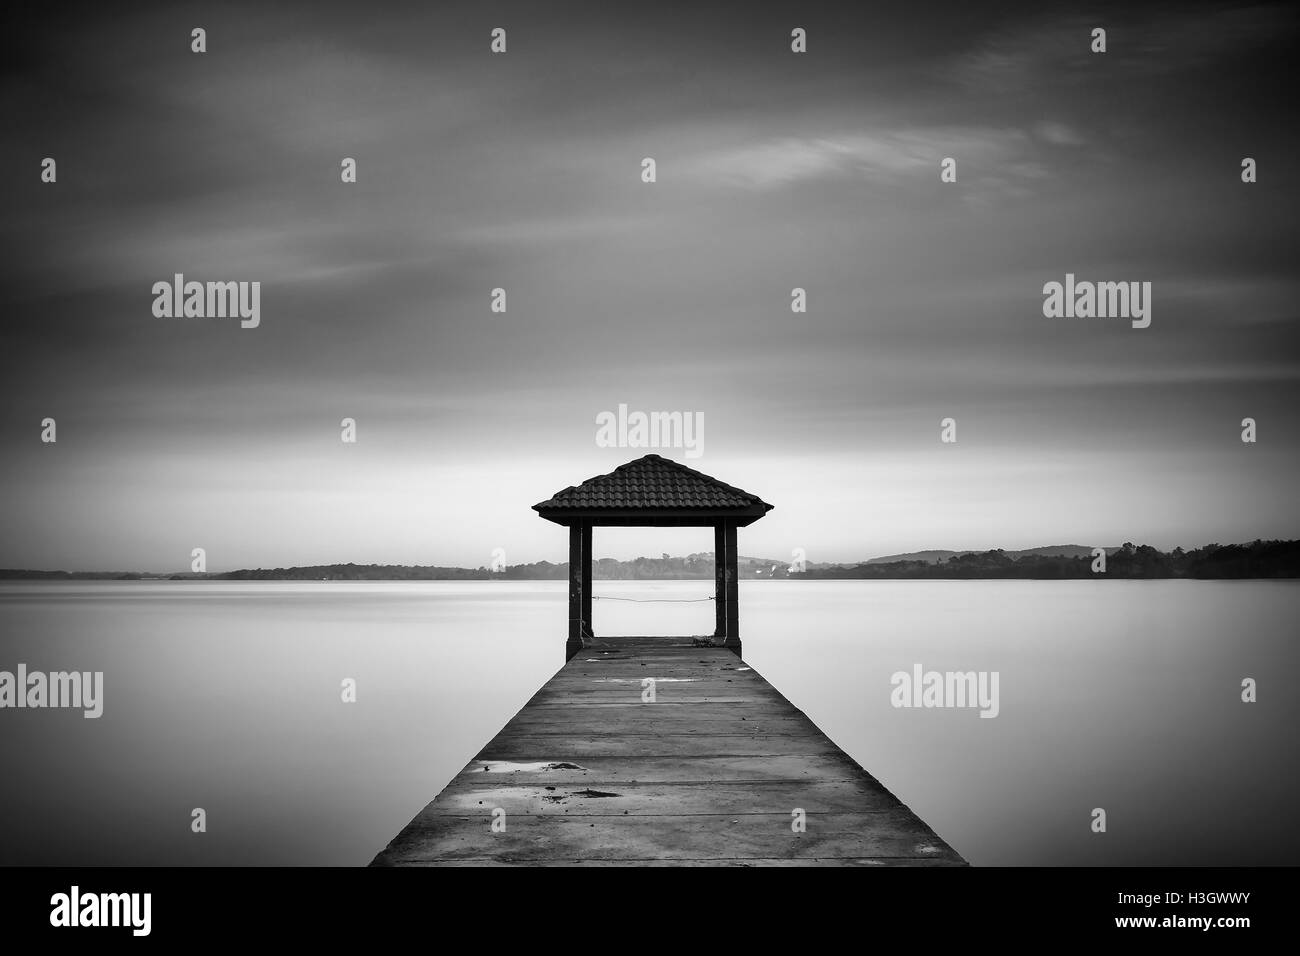 Minimalist image of Jetty - Stock Image